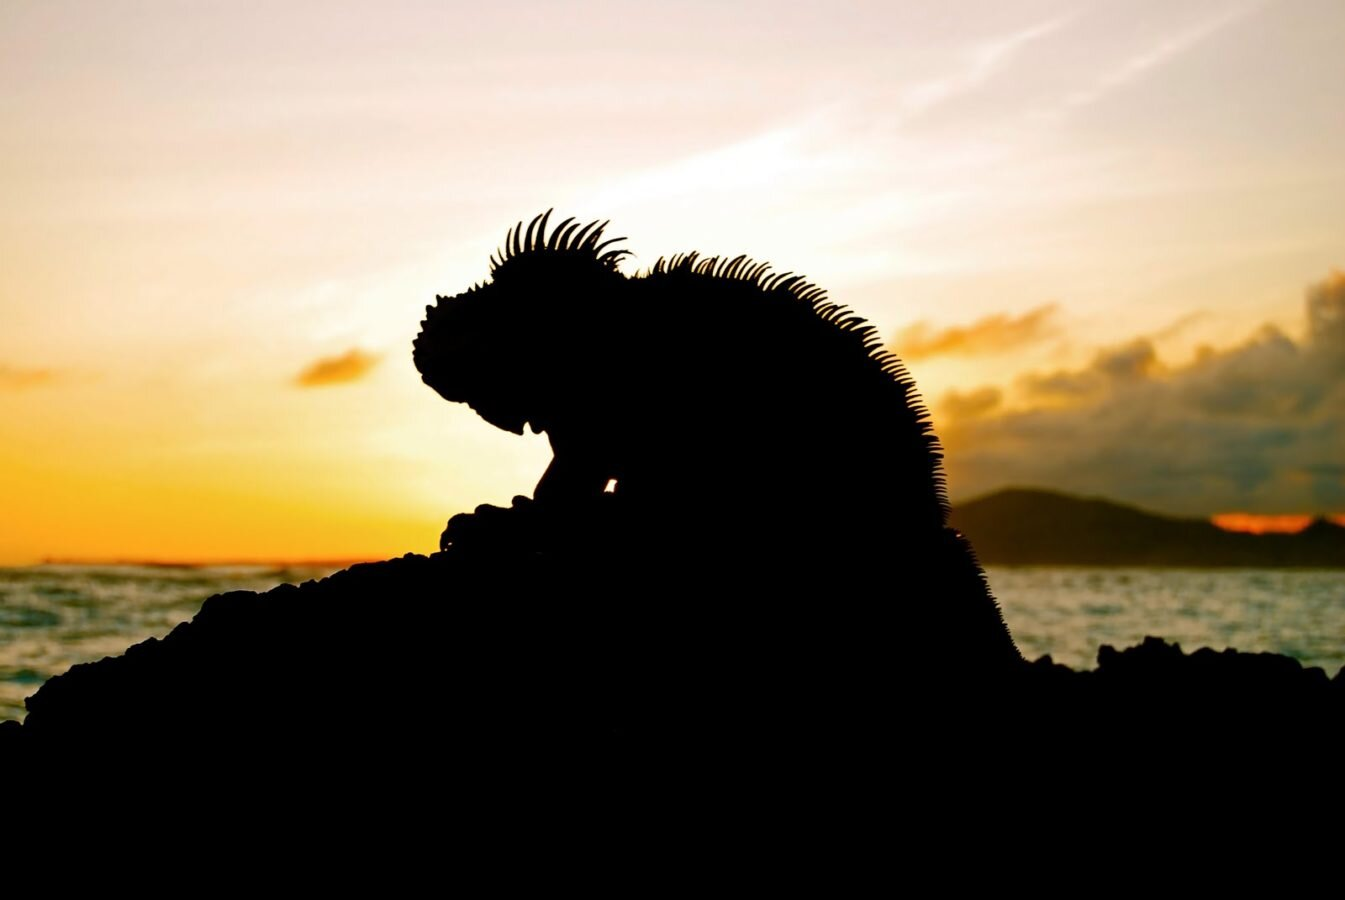 IguanaSunset.jpg